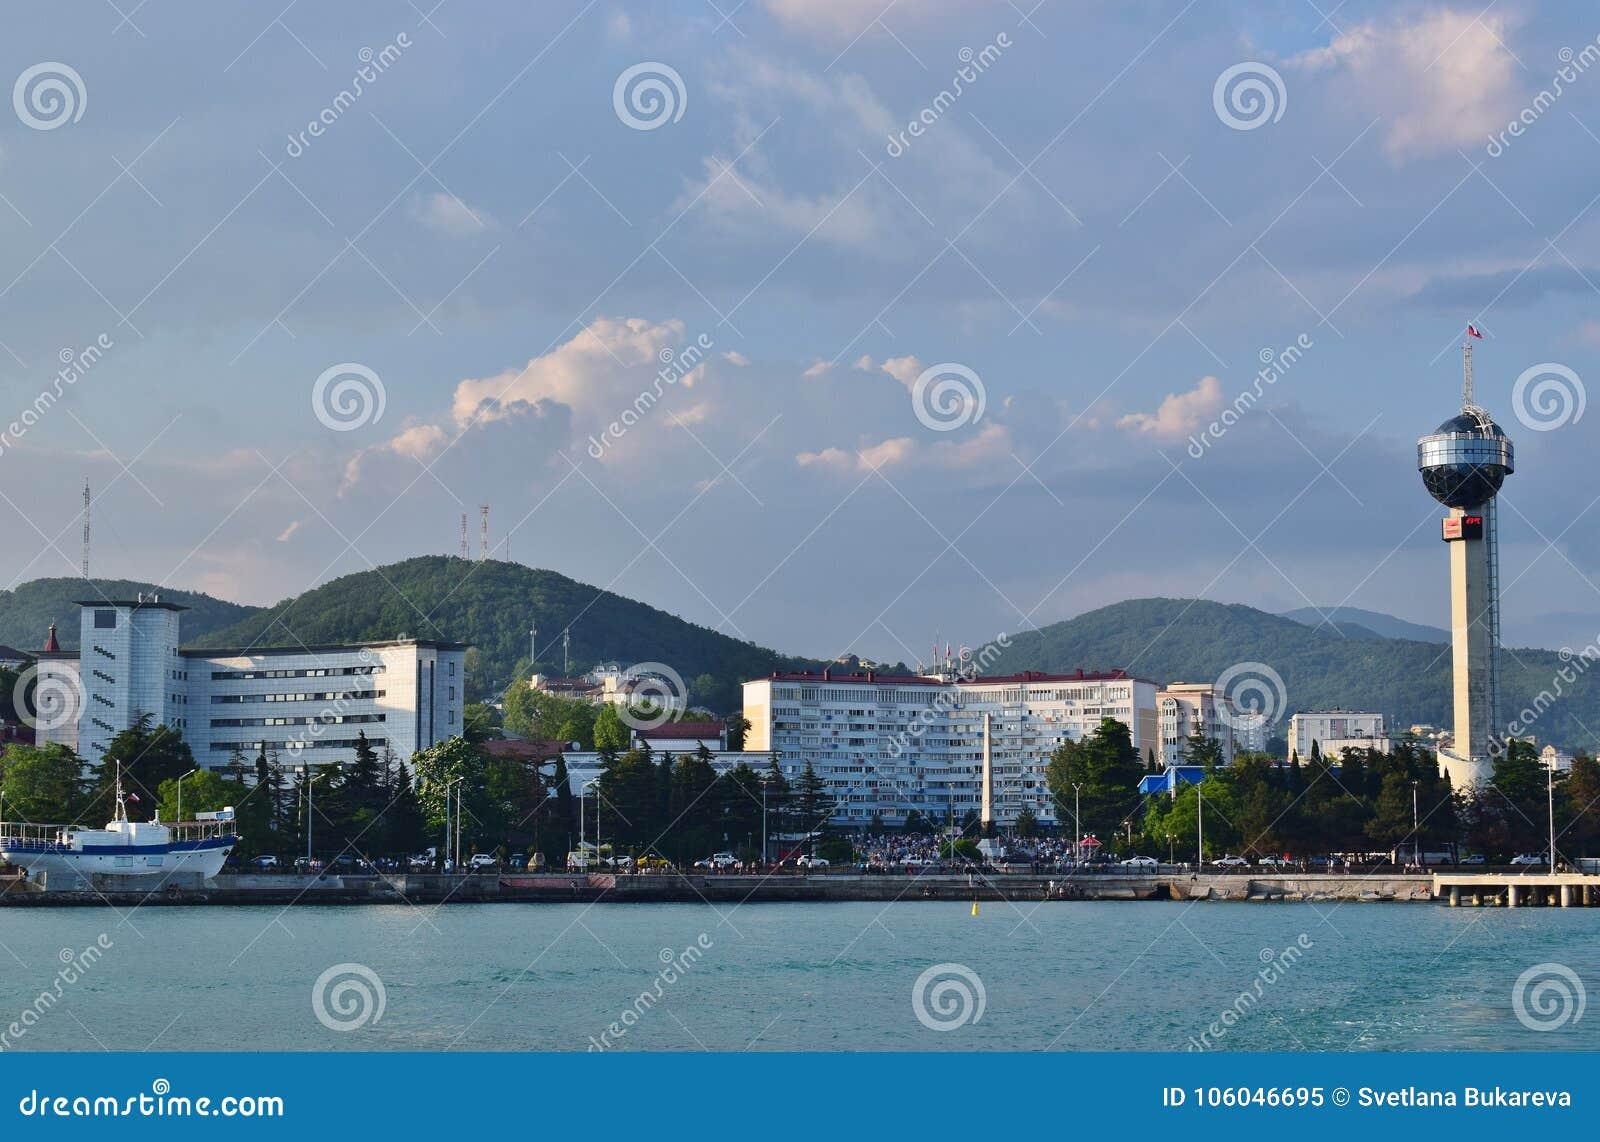 The embankment of city Tuapse in Krasnodar Krai, Russia.